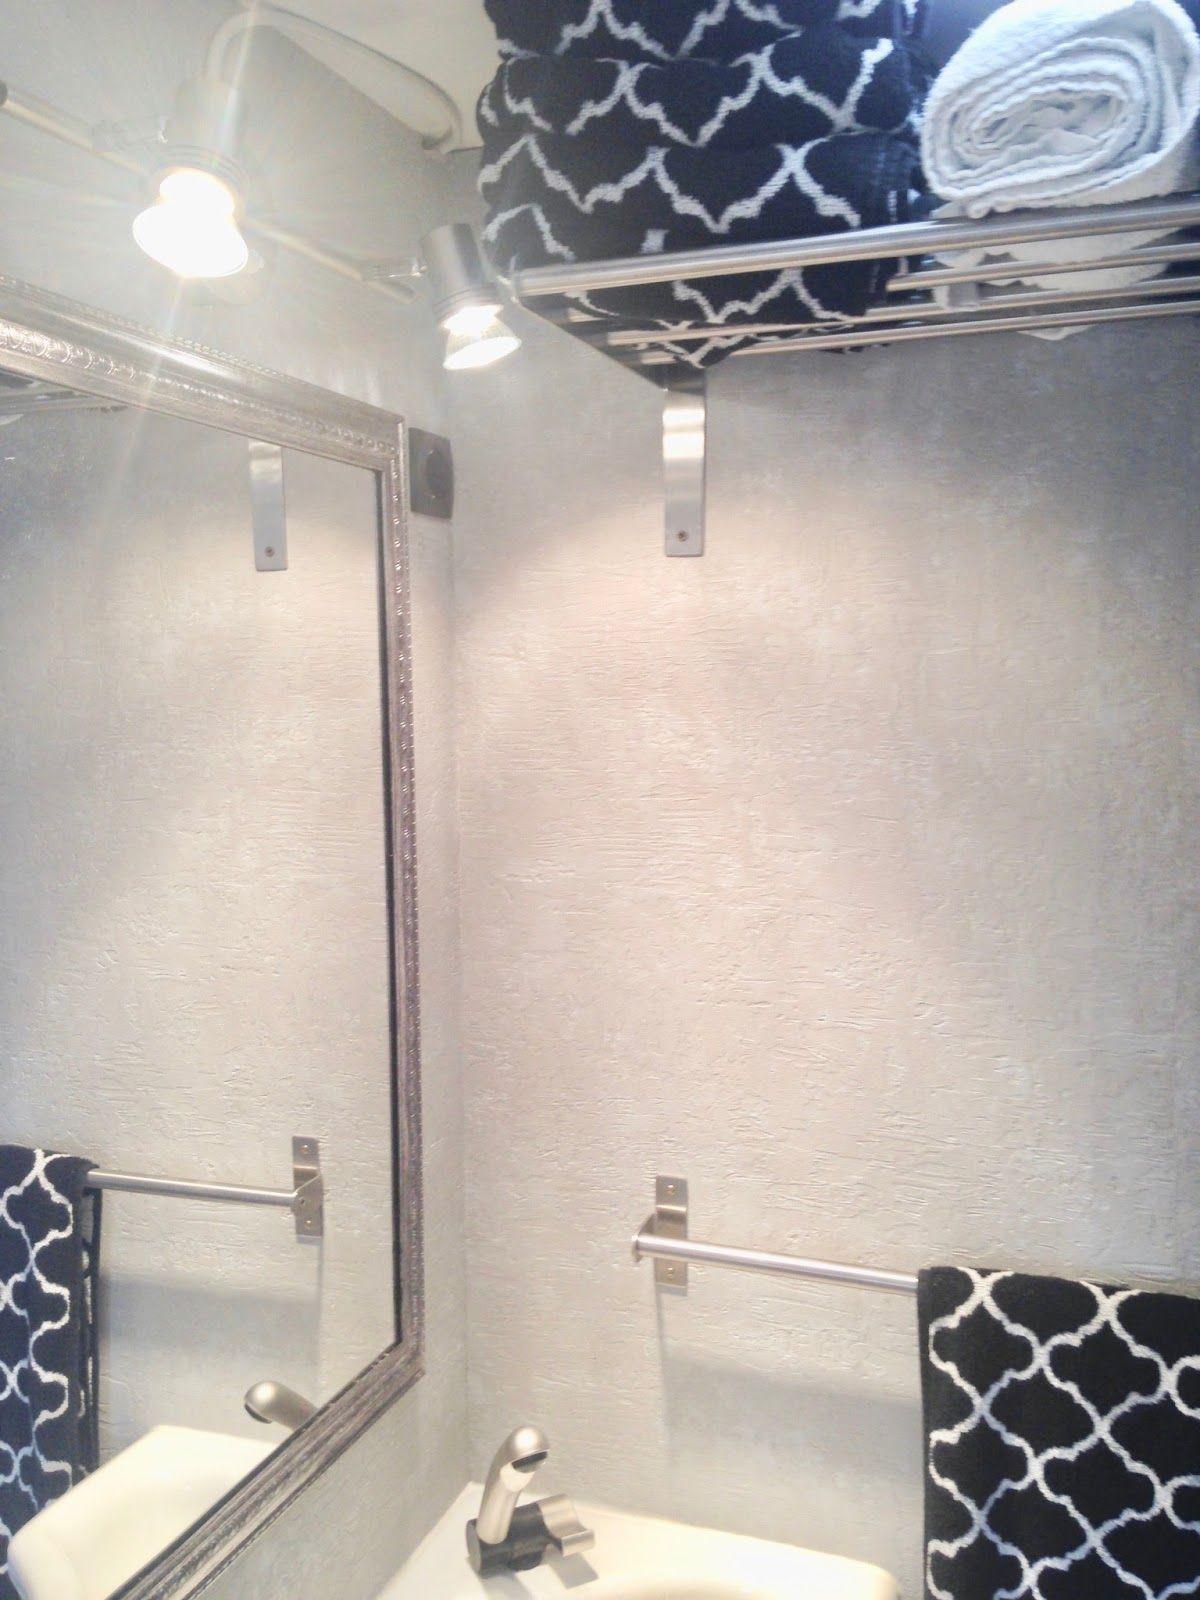 Wohnwagen Camping Glamping Caravan Makeover Renovierung So haben wir ...